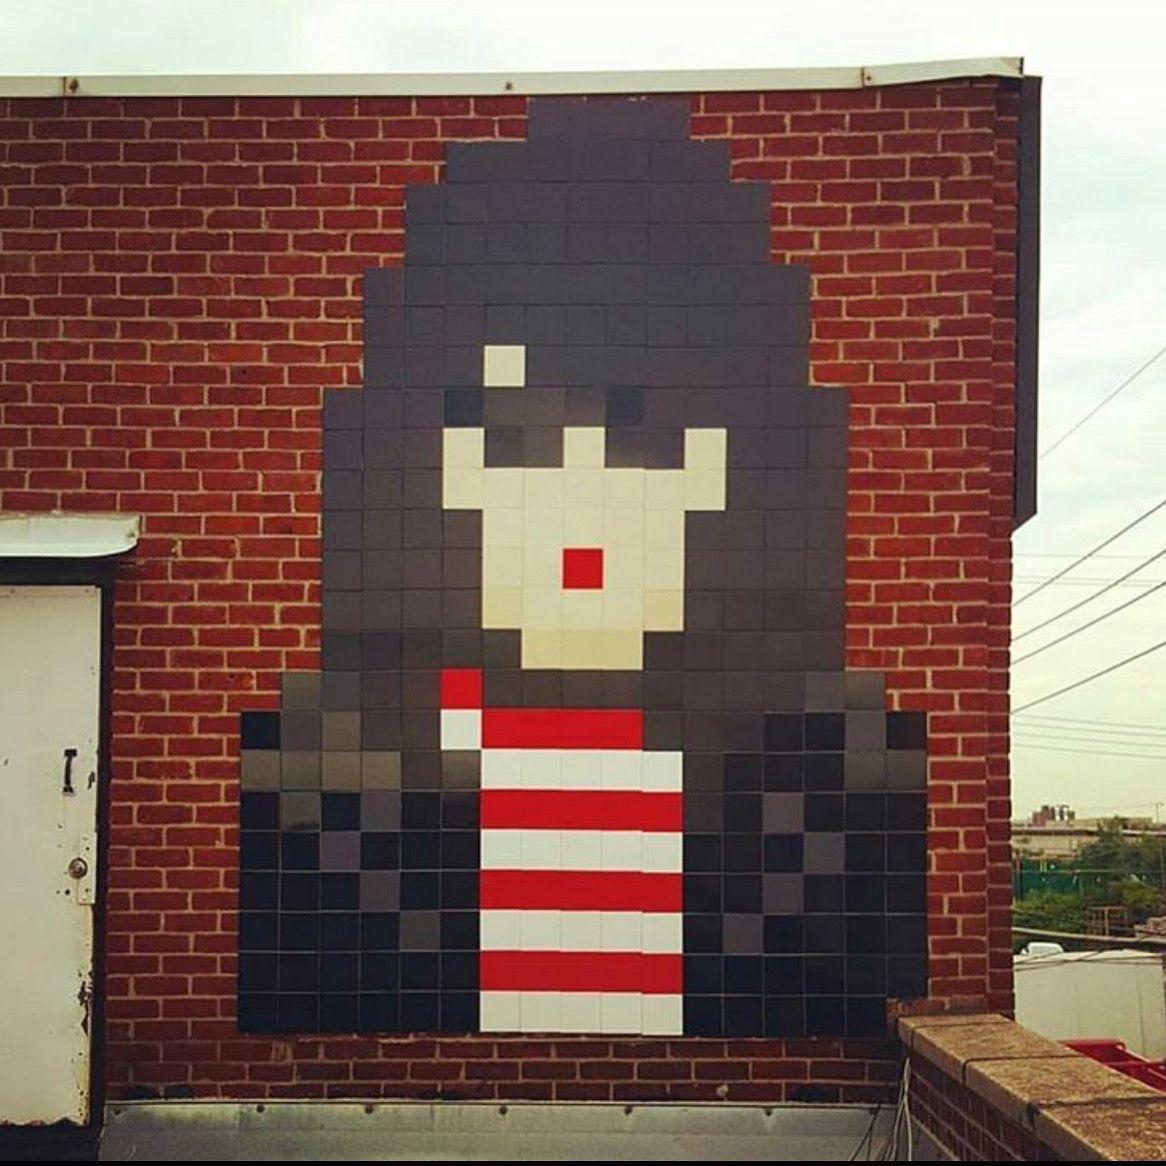 #ART #ArtPhotography #Travel #Explore #Invader #SpaceInvader #NY #UrbanArt #Graffiti #StreetArt #8bit #ArtLover #ModernArt #ArtstaGram #PositiveVibes